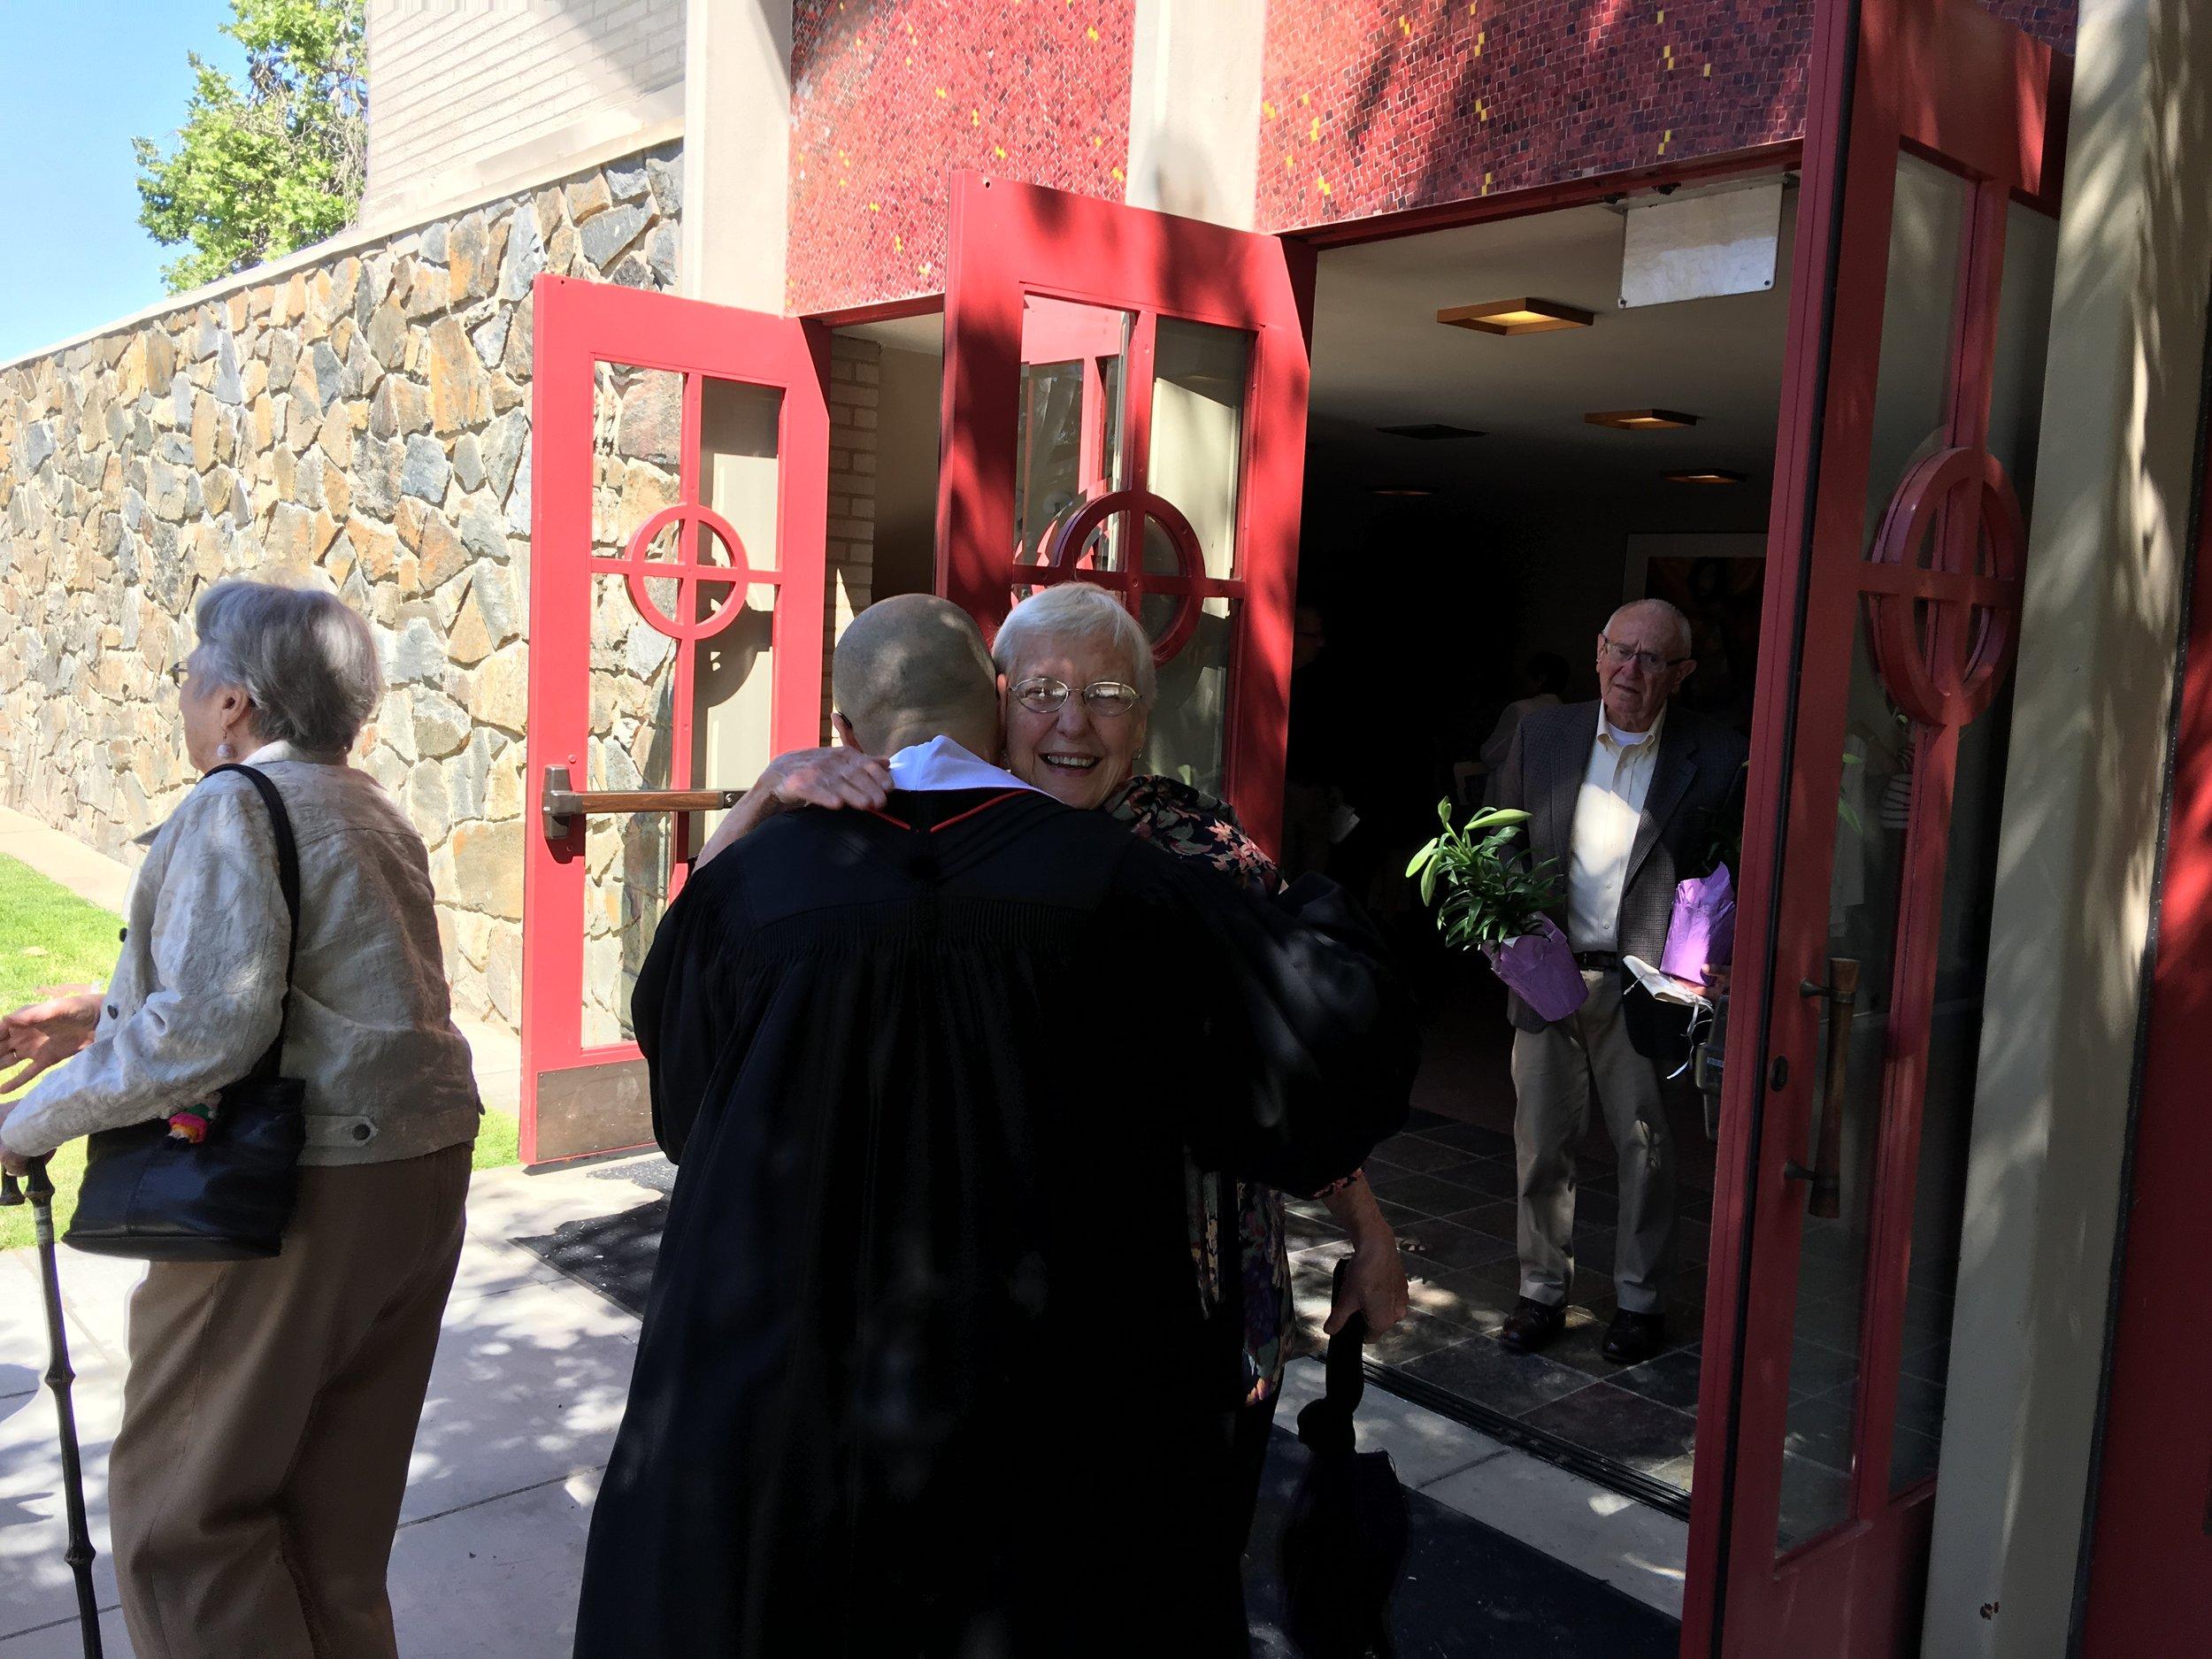 Claremont-Presbyterian-Church-Sunday-greeting.JPG